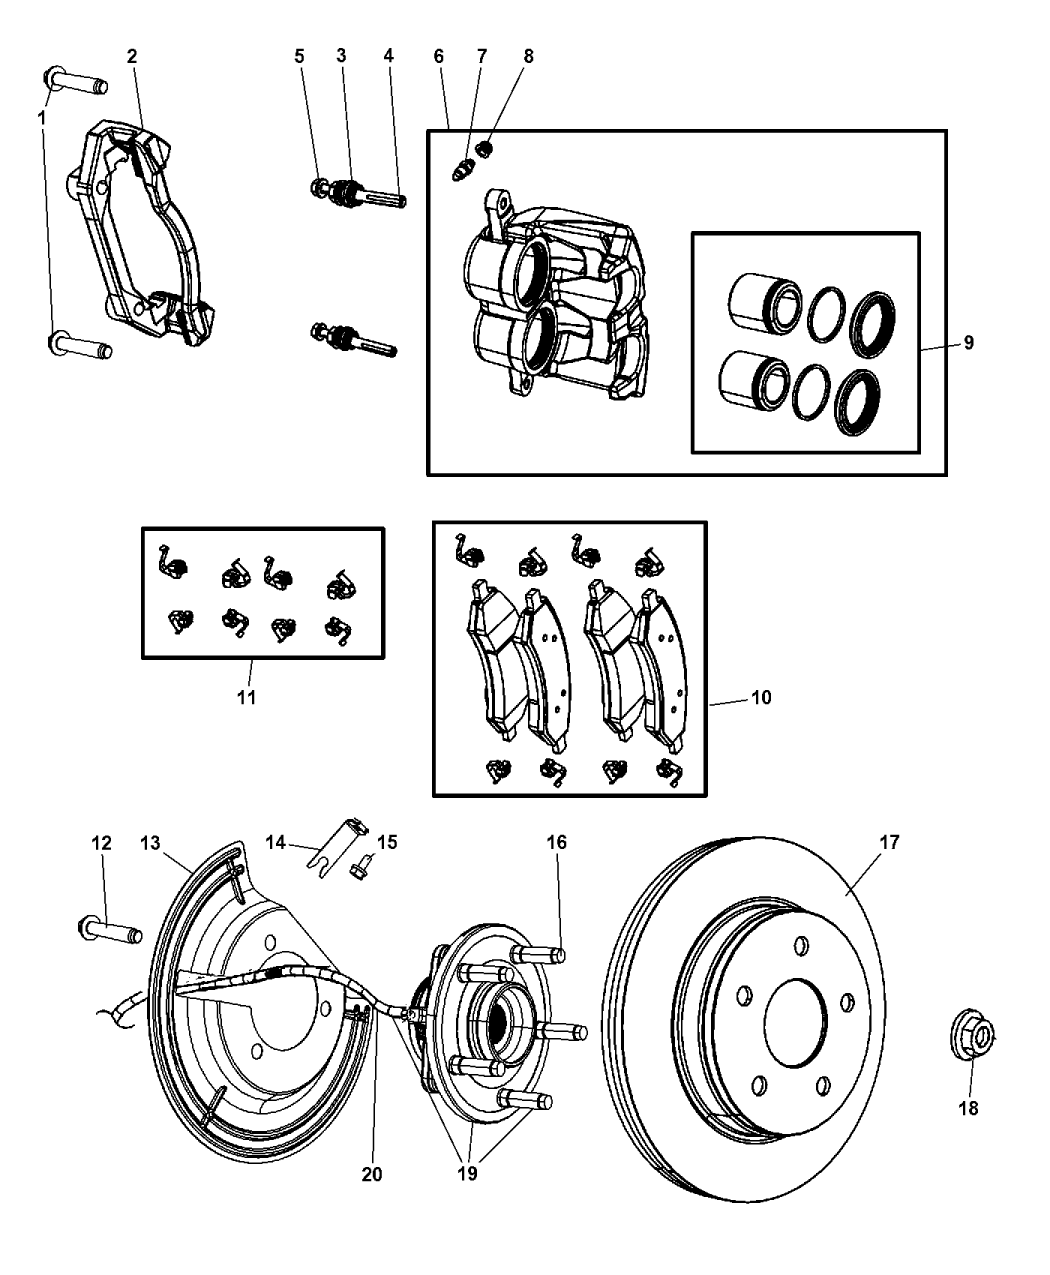 2009 dodge ram 1500 front brakes